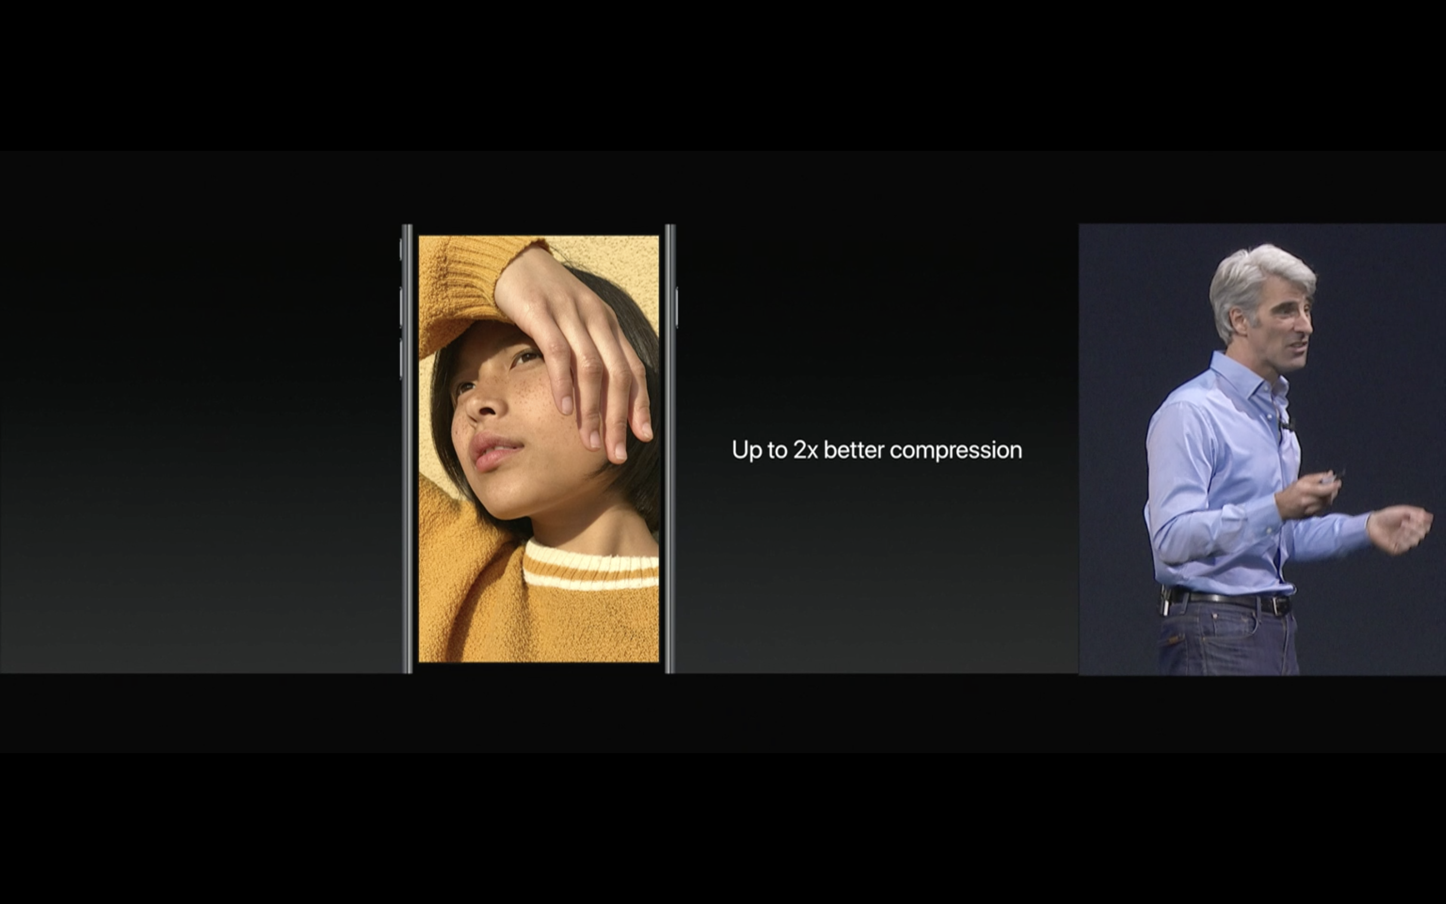 iOS11-2017-WWDC17-23.png